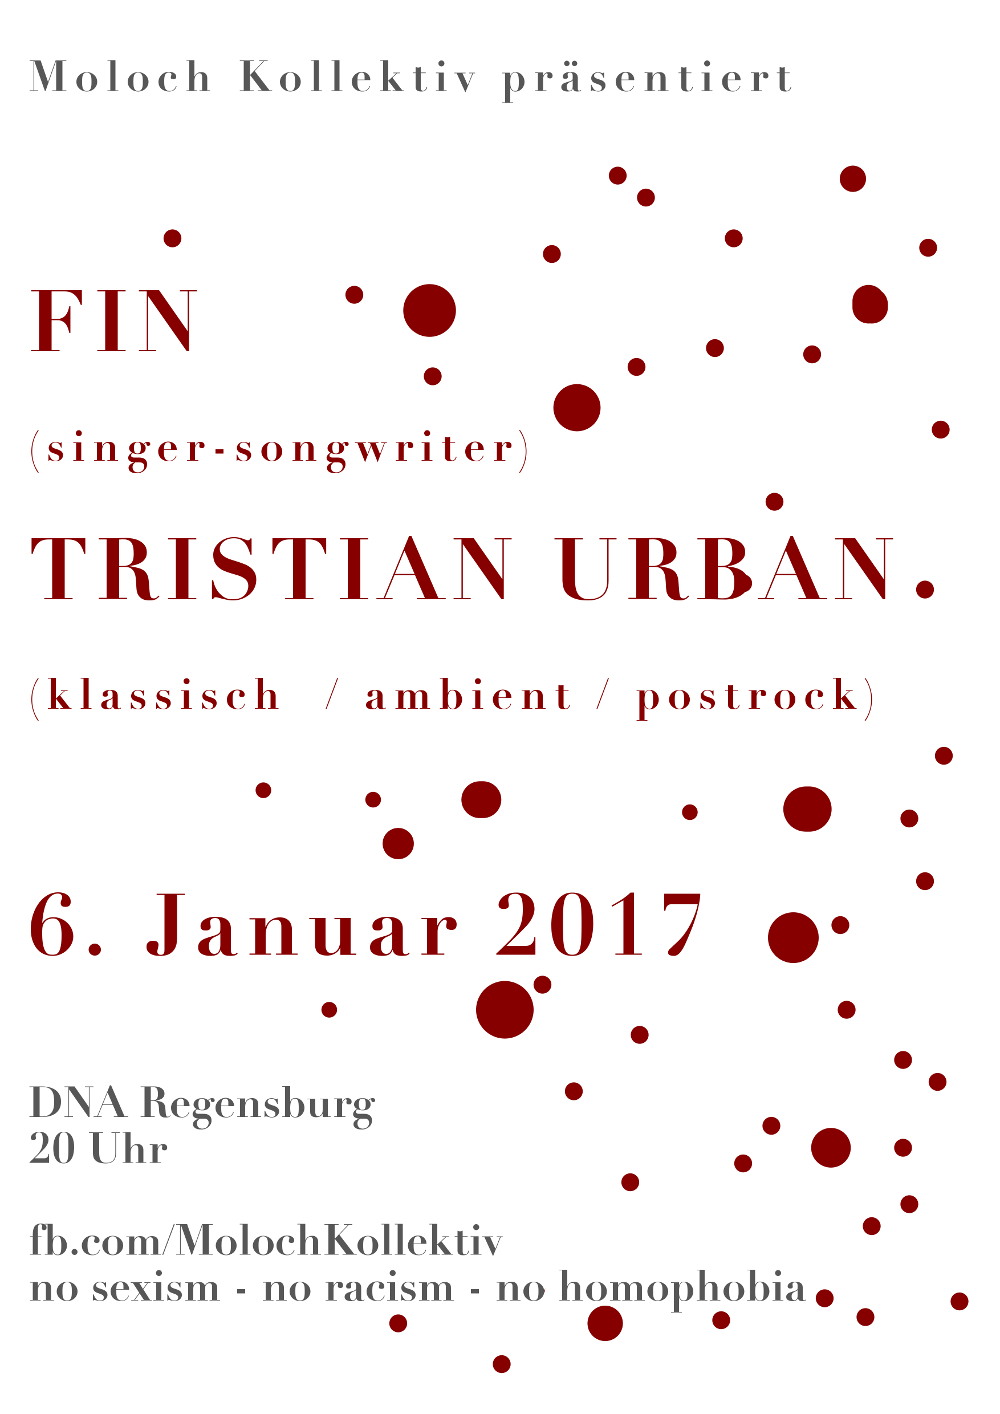 2017-01-06 Moloch Kollektiv + Fin + Tristian Urban